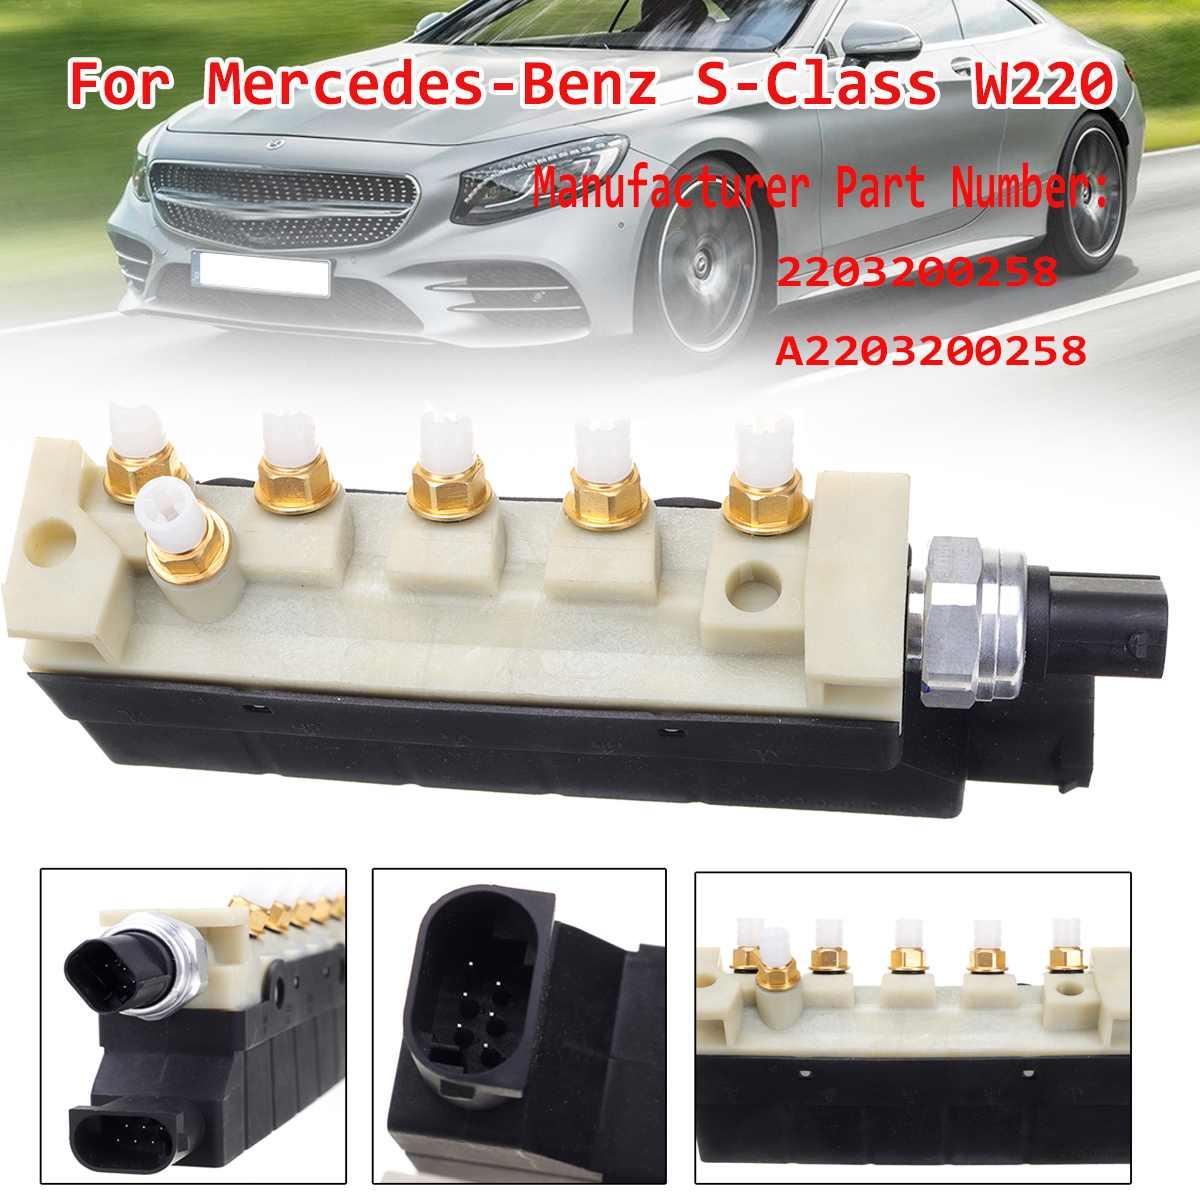 Air Suspension Compressor Valve Block For Mercedes Benz S Class W220 2203200258 S350 S430 S500 S600